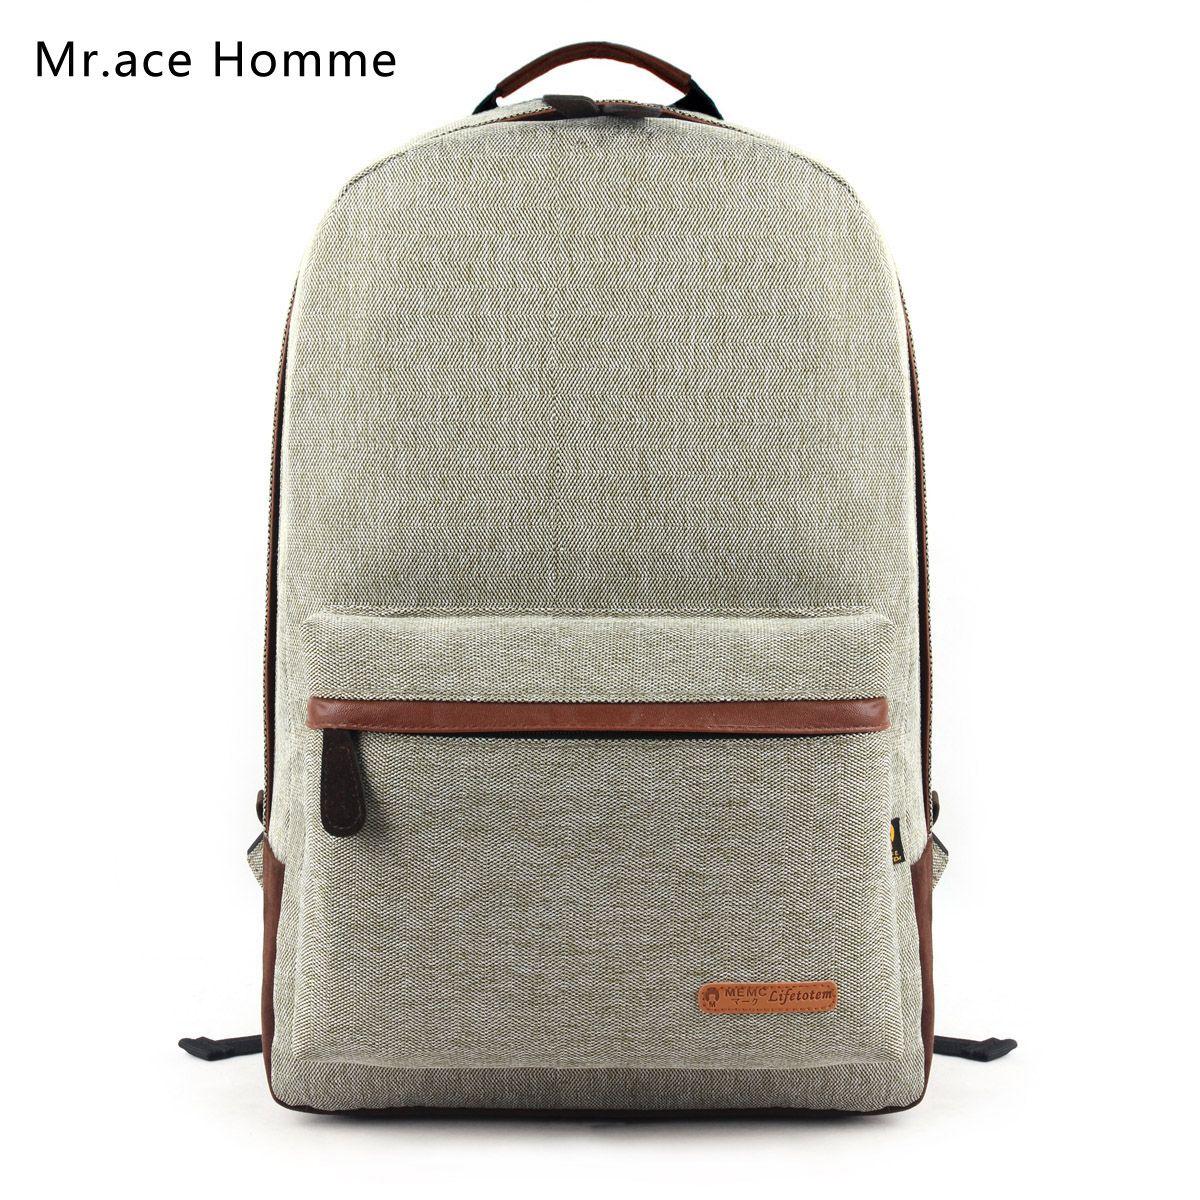 Cool Backpack | Urban Backpacks | Pinterest